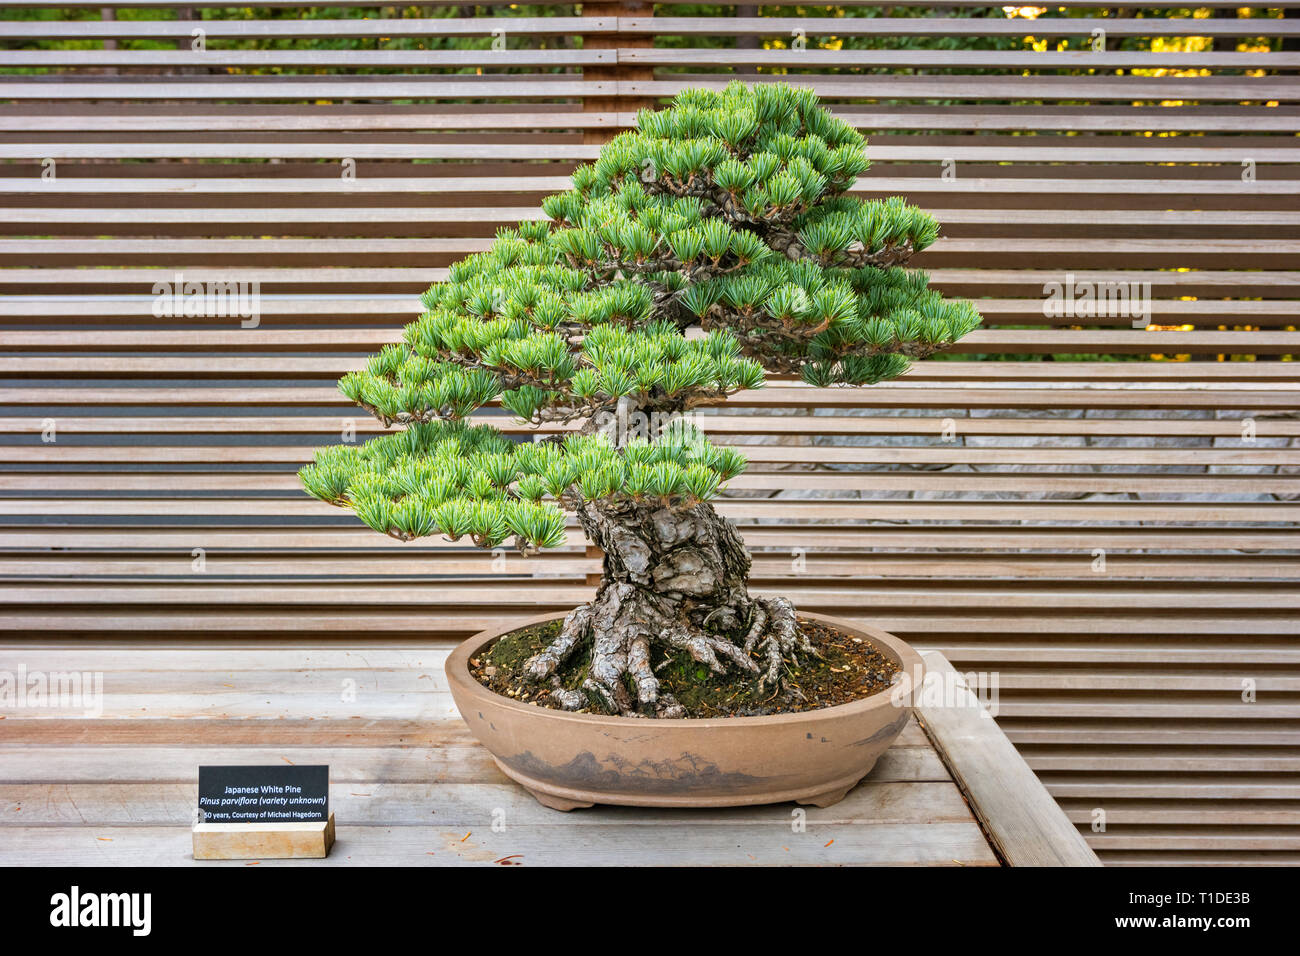 50 Years Old Japanese White Pine Bonsai Tree In The Portland Japanese Garden Stock Photo Alamy